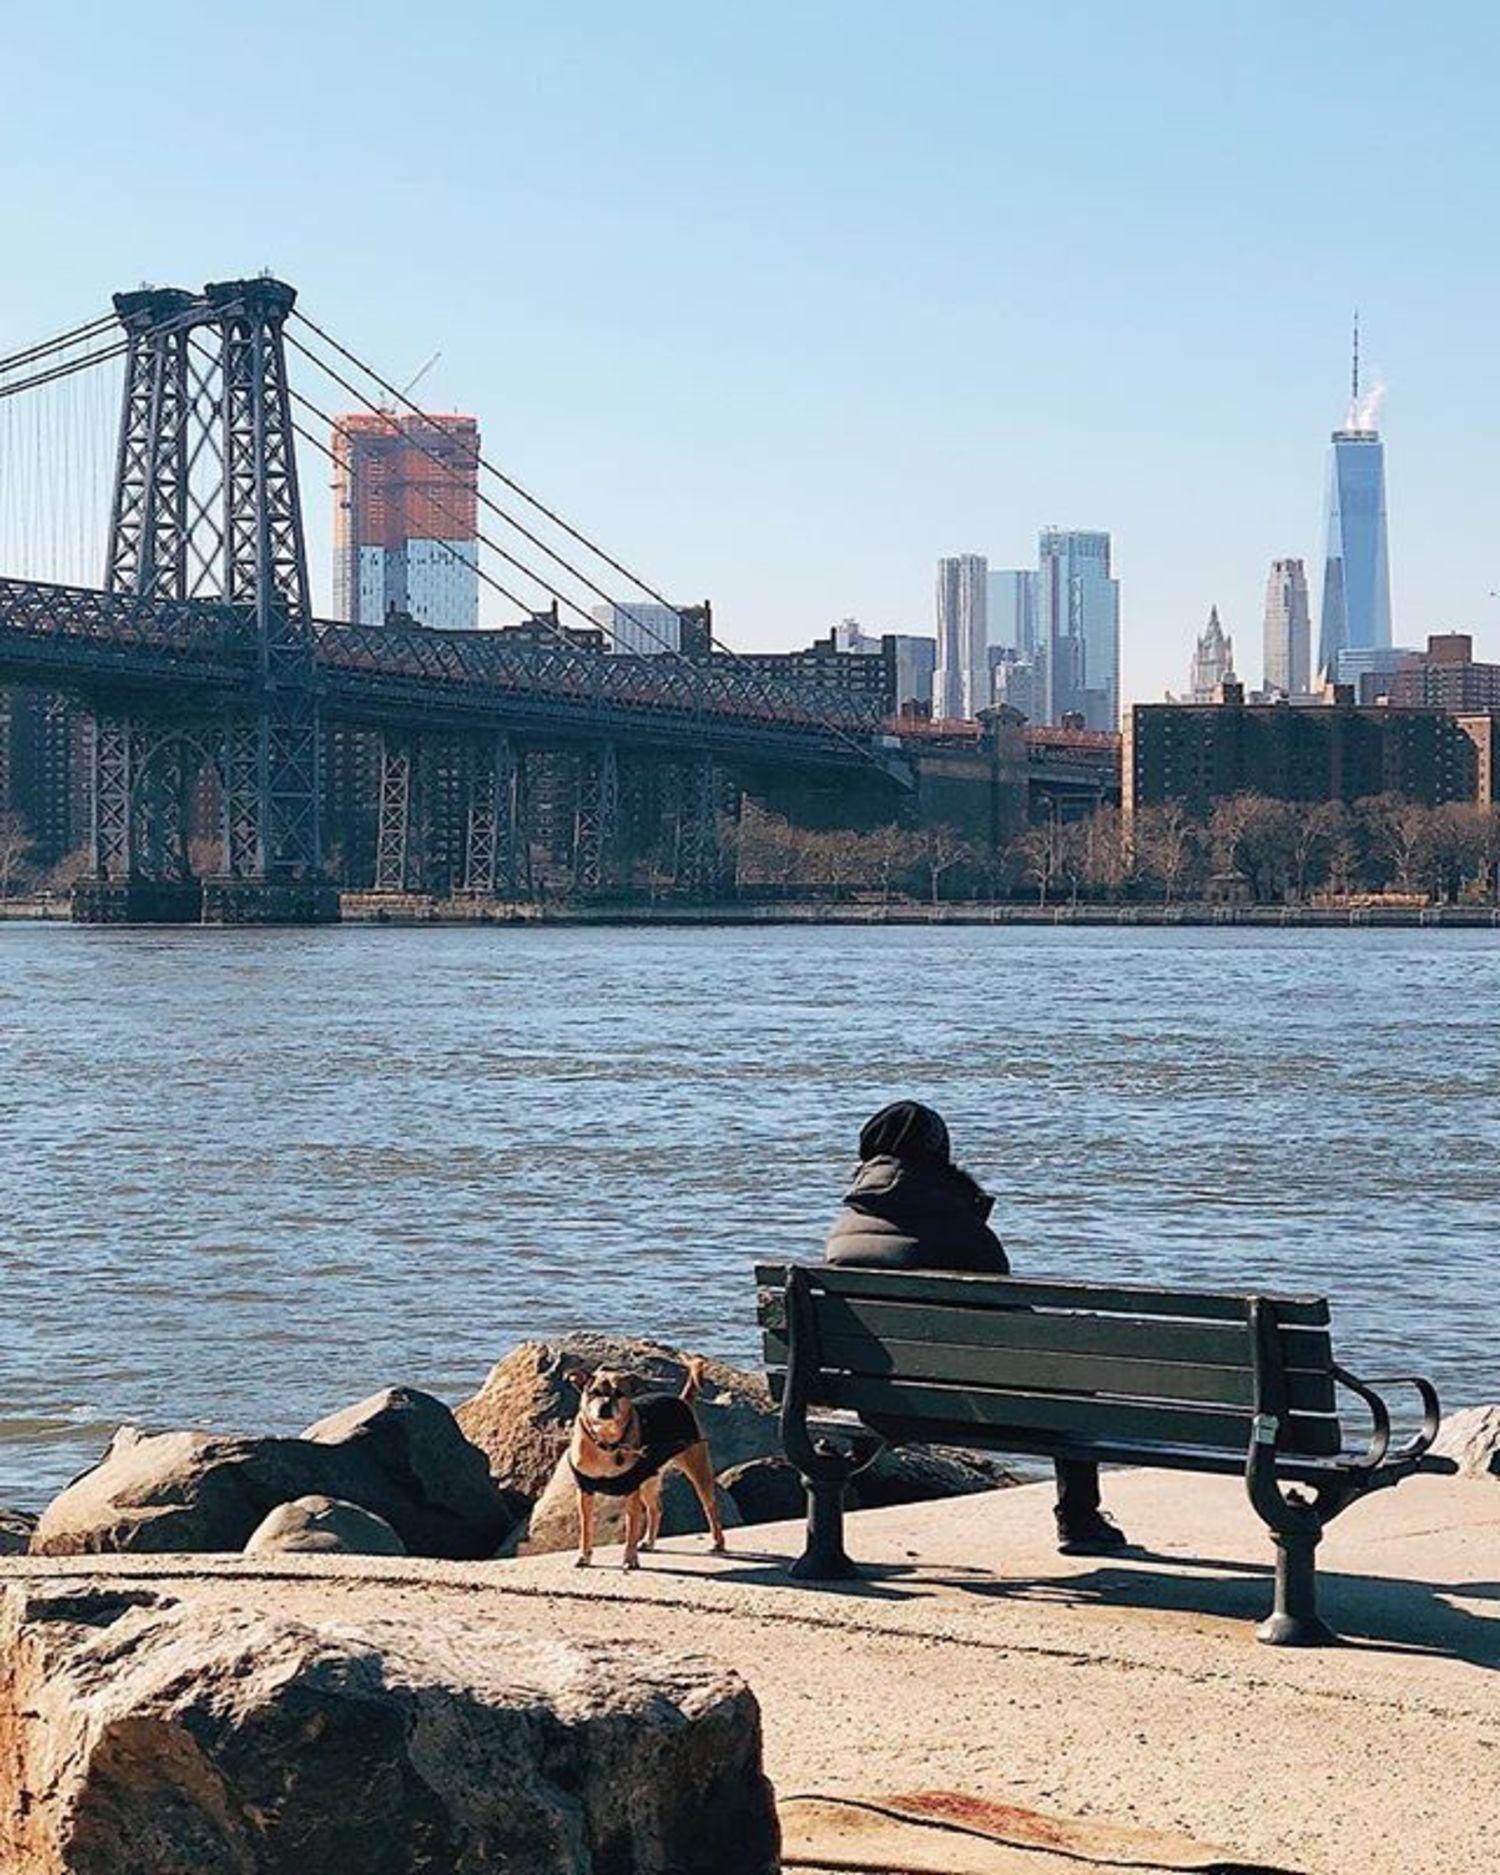 Williamsburg Waterfront, Brooklyn. Photo via @iwyndt #viewingnyc #newyork #newyorkcity #nyc